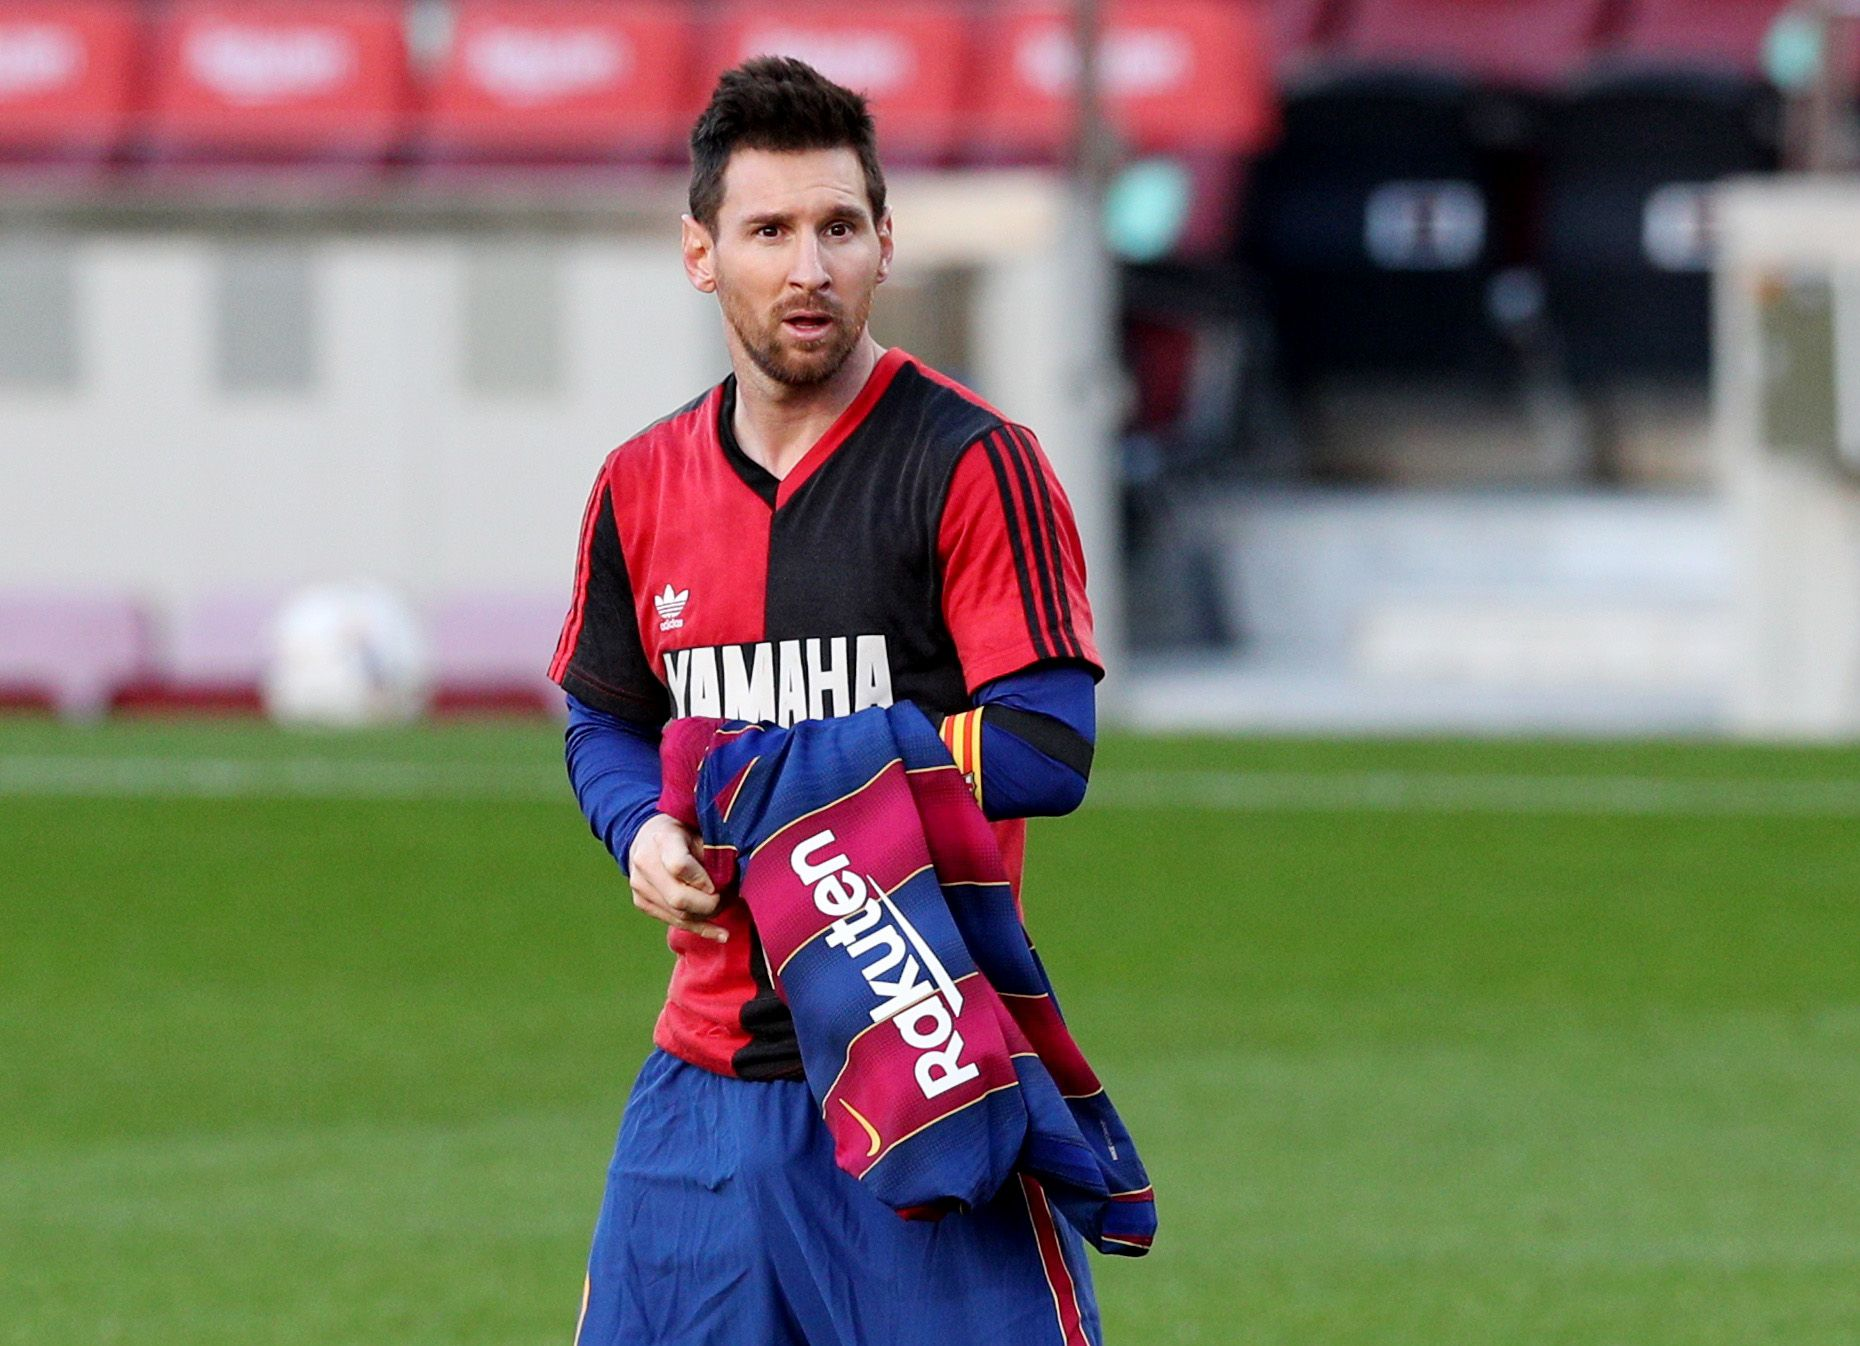 Lionel Messi recibió una tarjeta amarilla por sacarse la remera